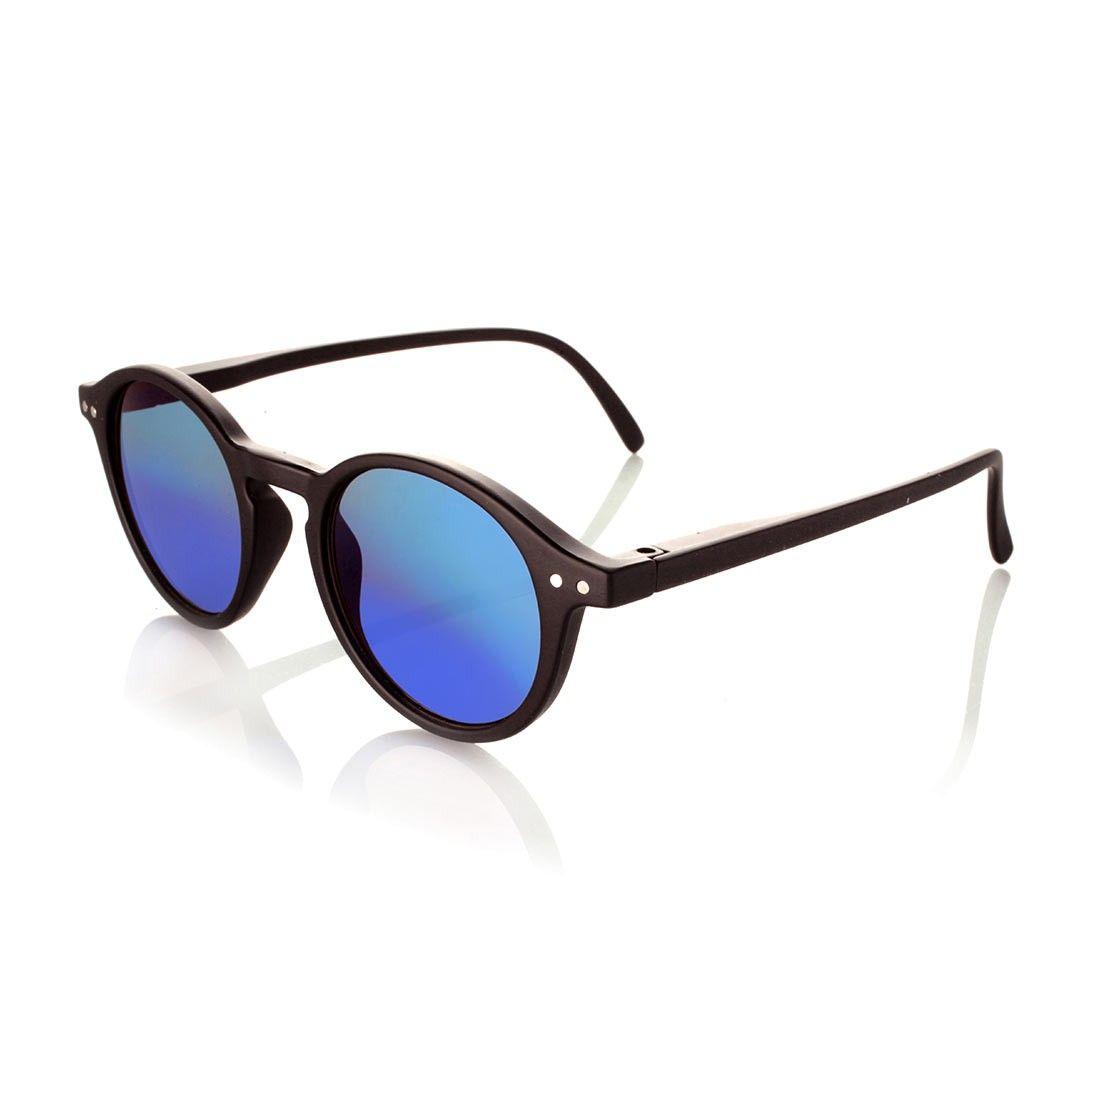 Arctic Blue ® - Nuovi 2013 / 2014 - Occhiali da sole / Occhiali da sci - UV400 - Occhiali Sportivi tgChWanl